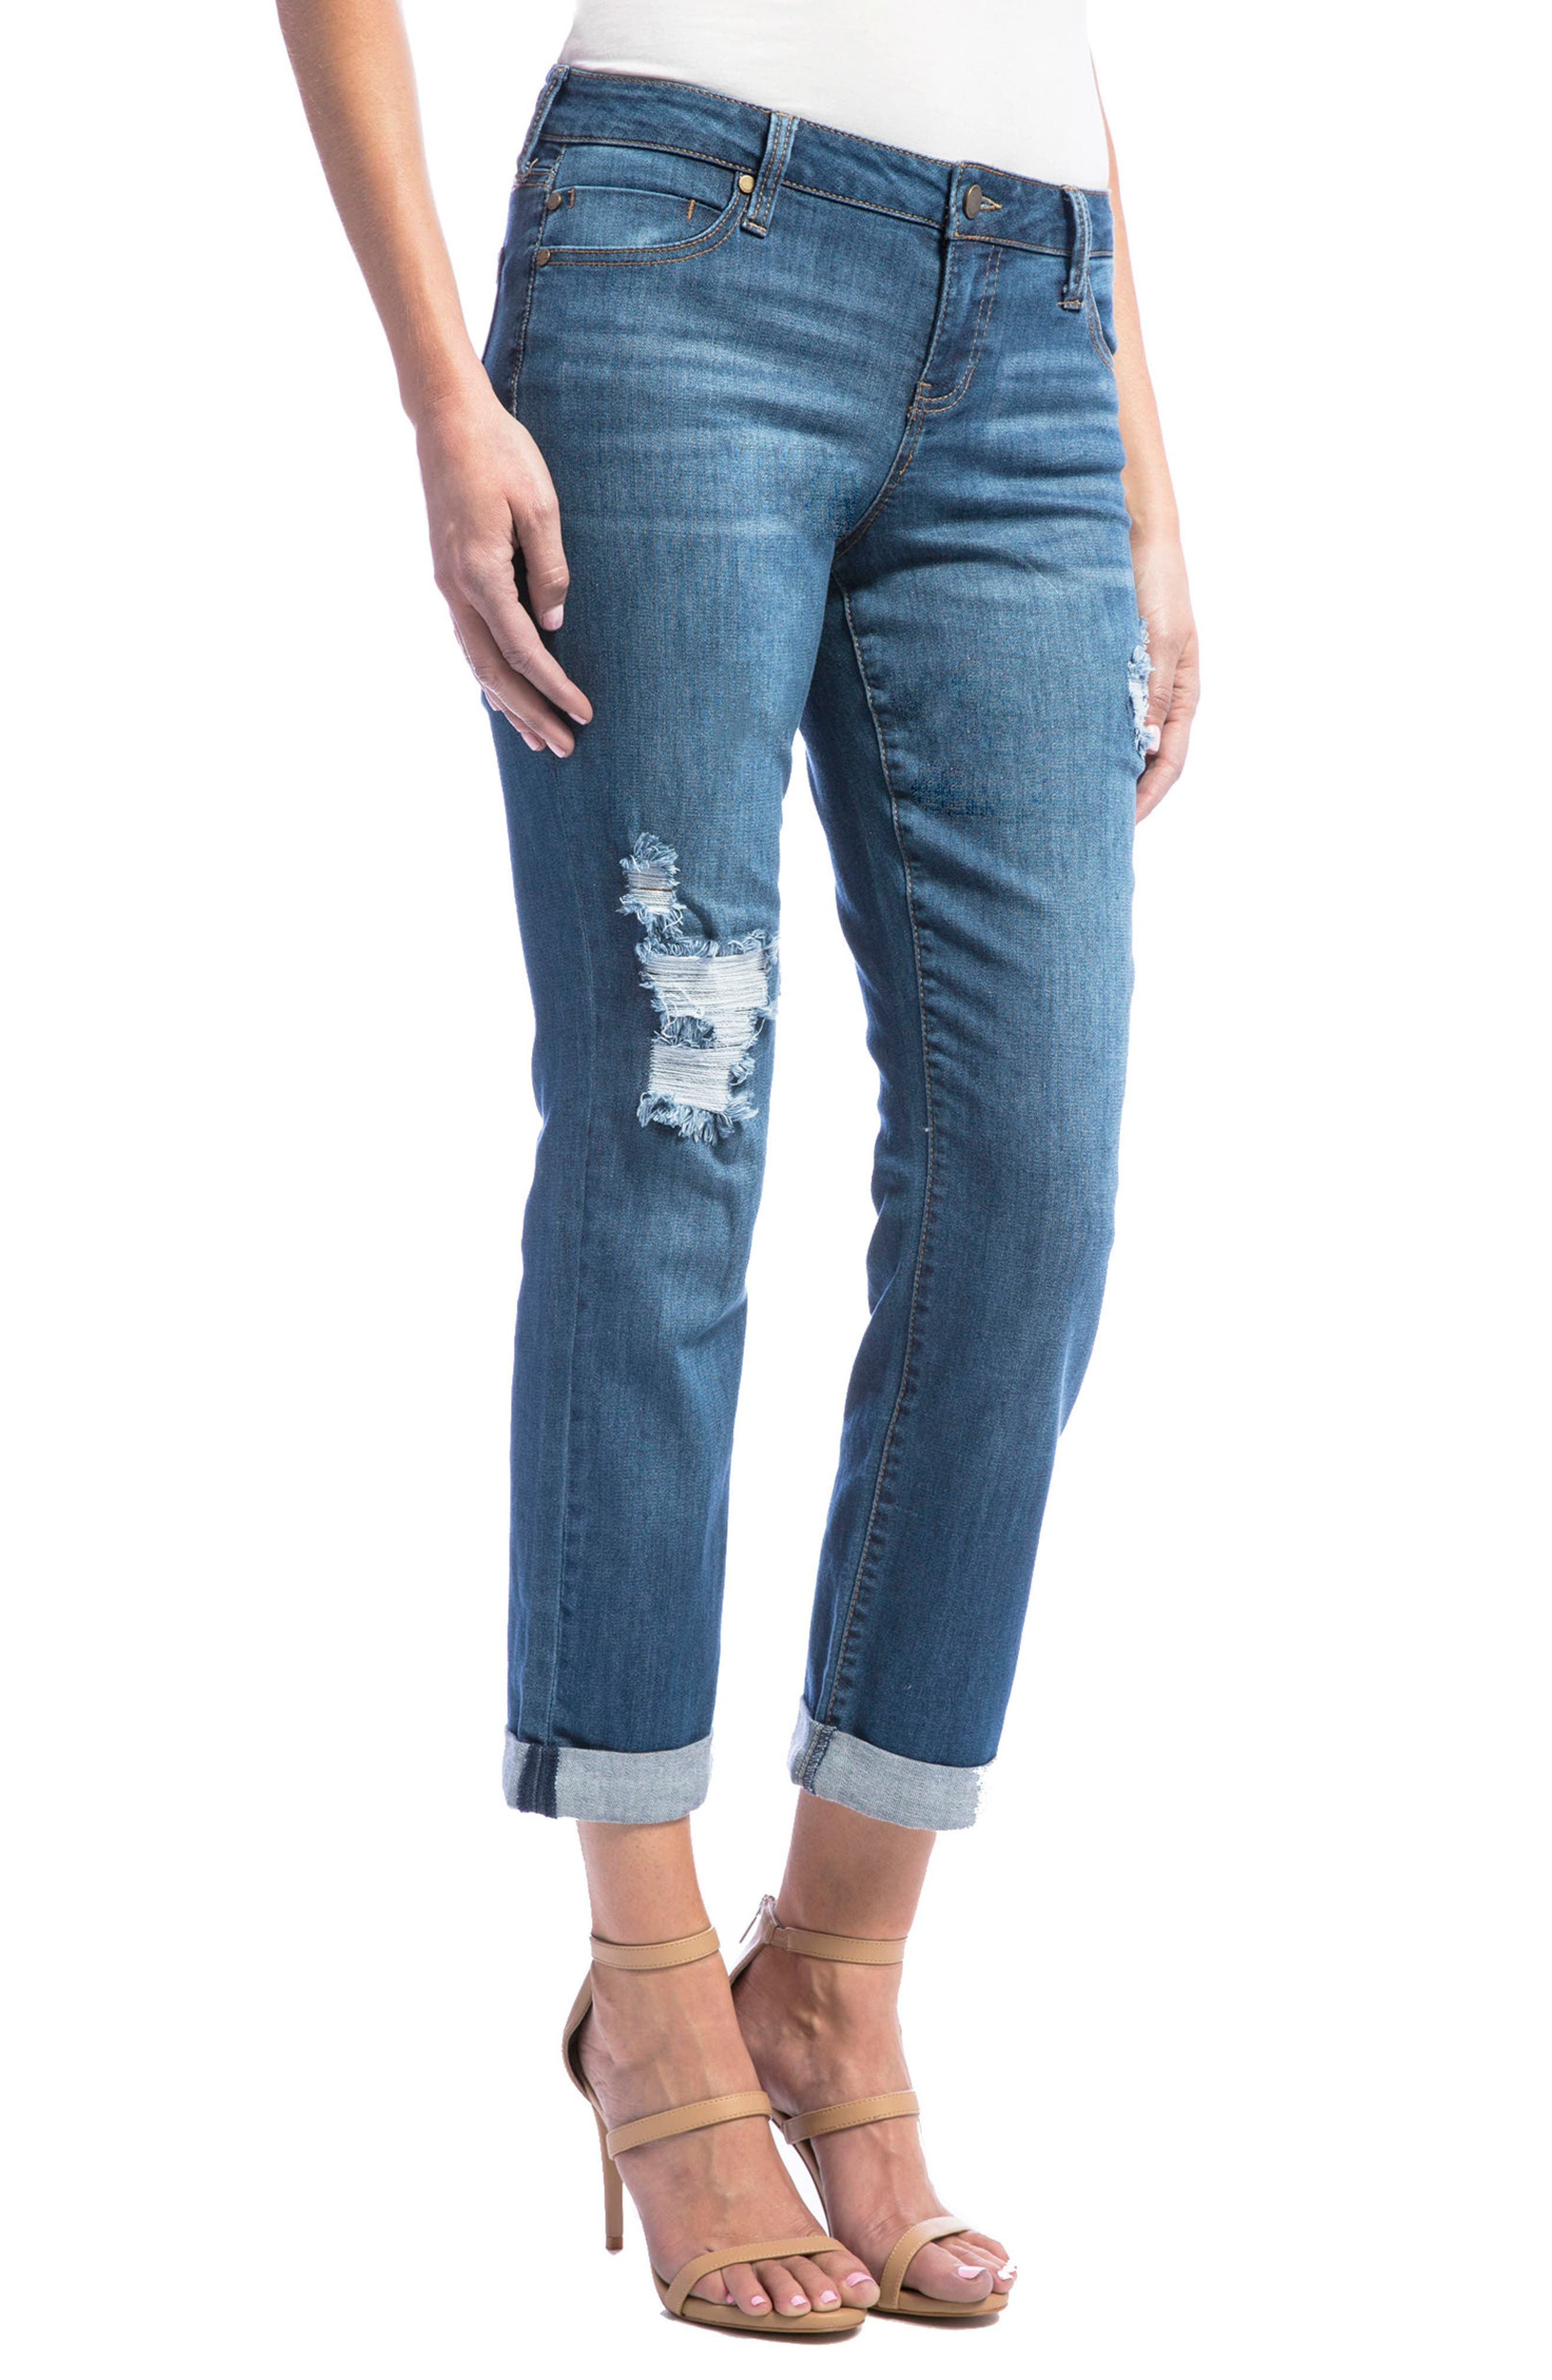 Jeans Company Peyton Slim Stretch Crop Boyfriend Jeans,                             Alternate thumbnail 3, color,                             401